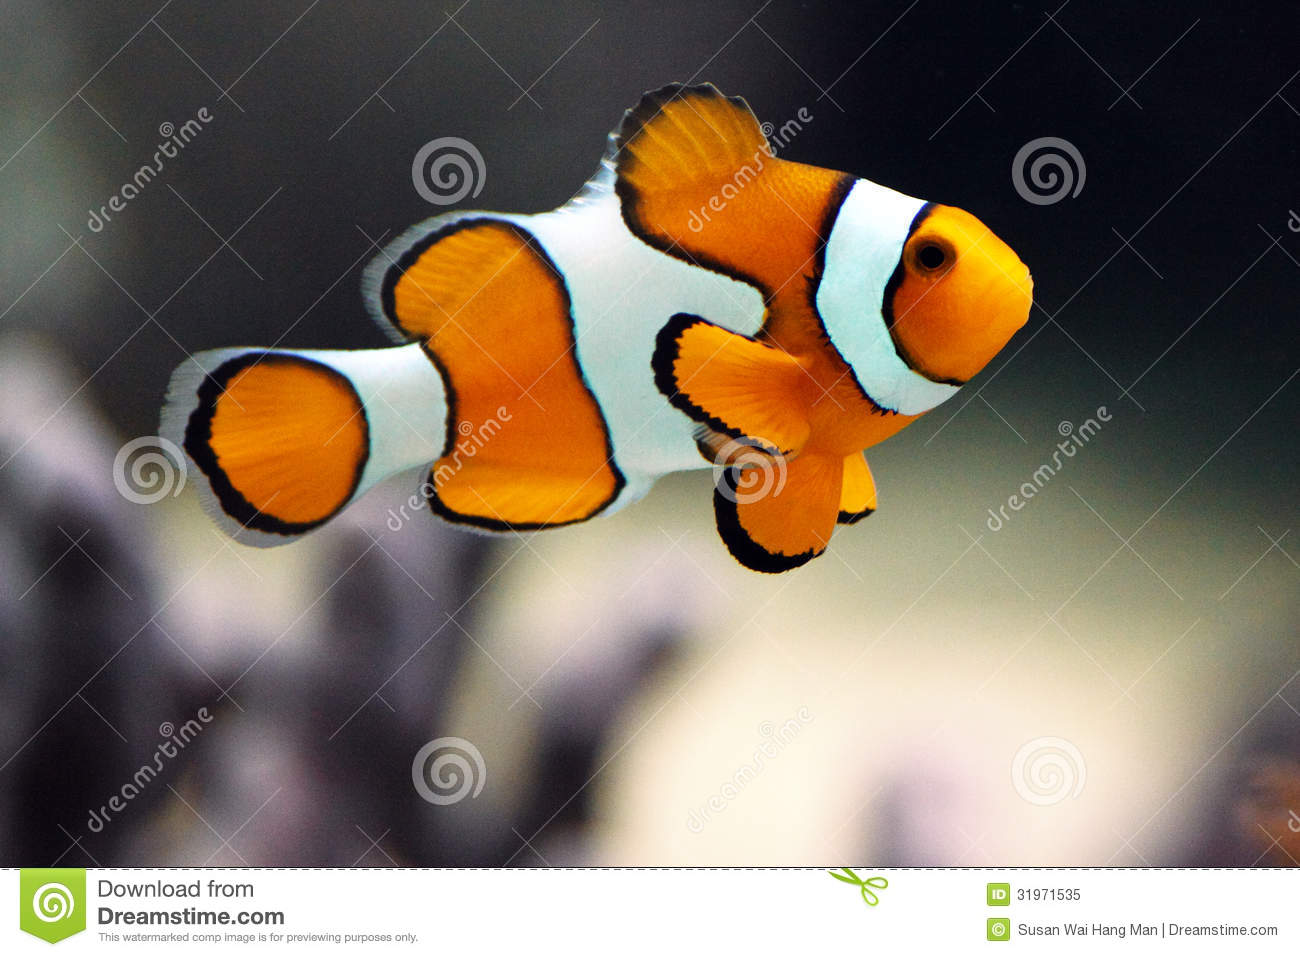 Clown Fish Or Clown Anemonefish.